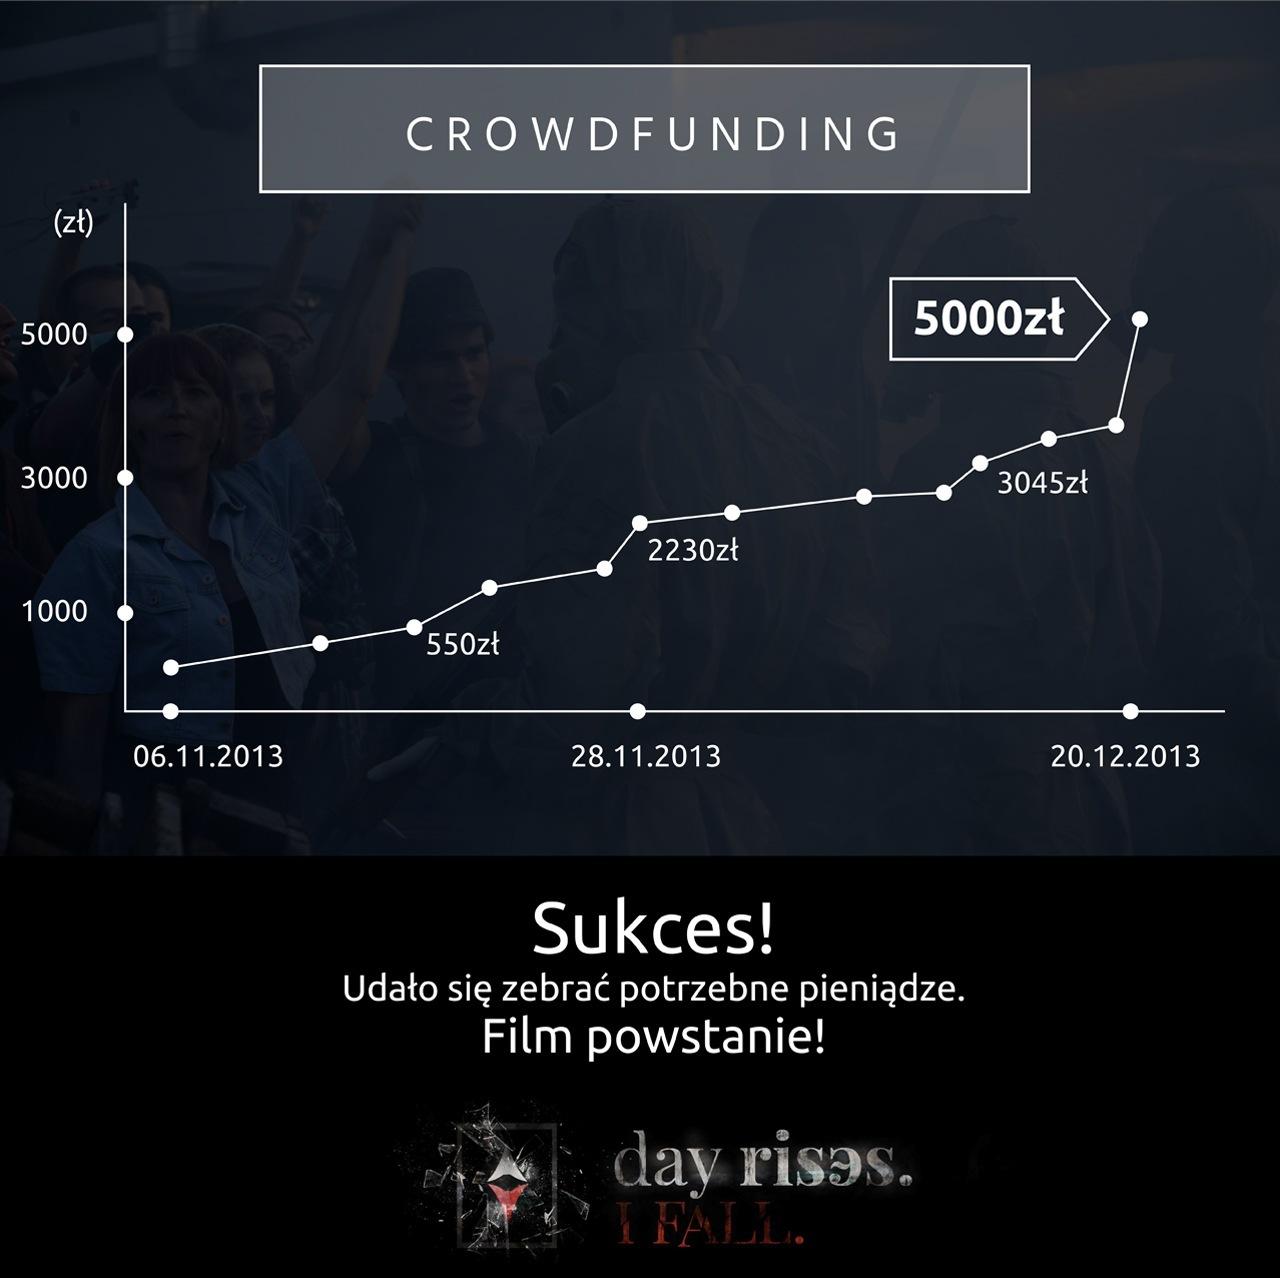 Case Study: Akcja Crowdfundingowa